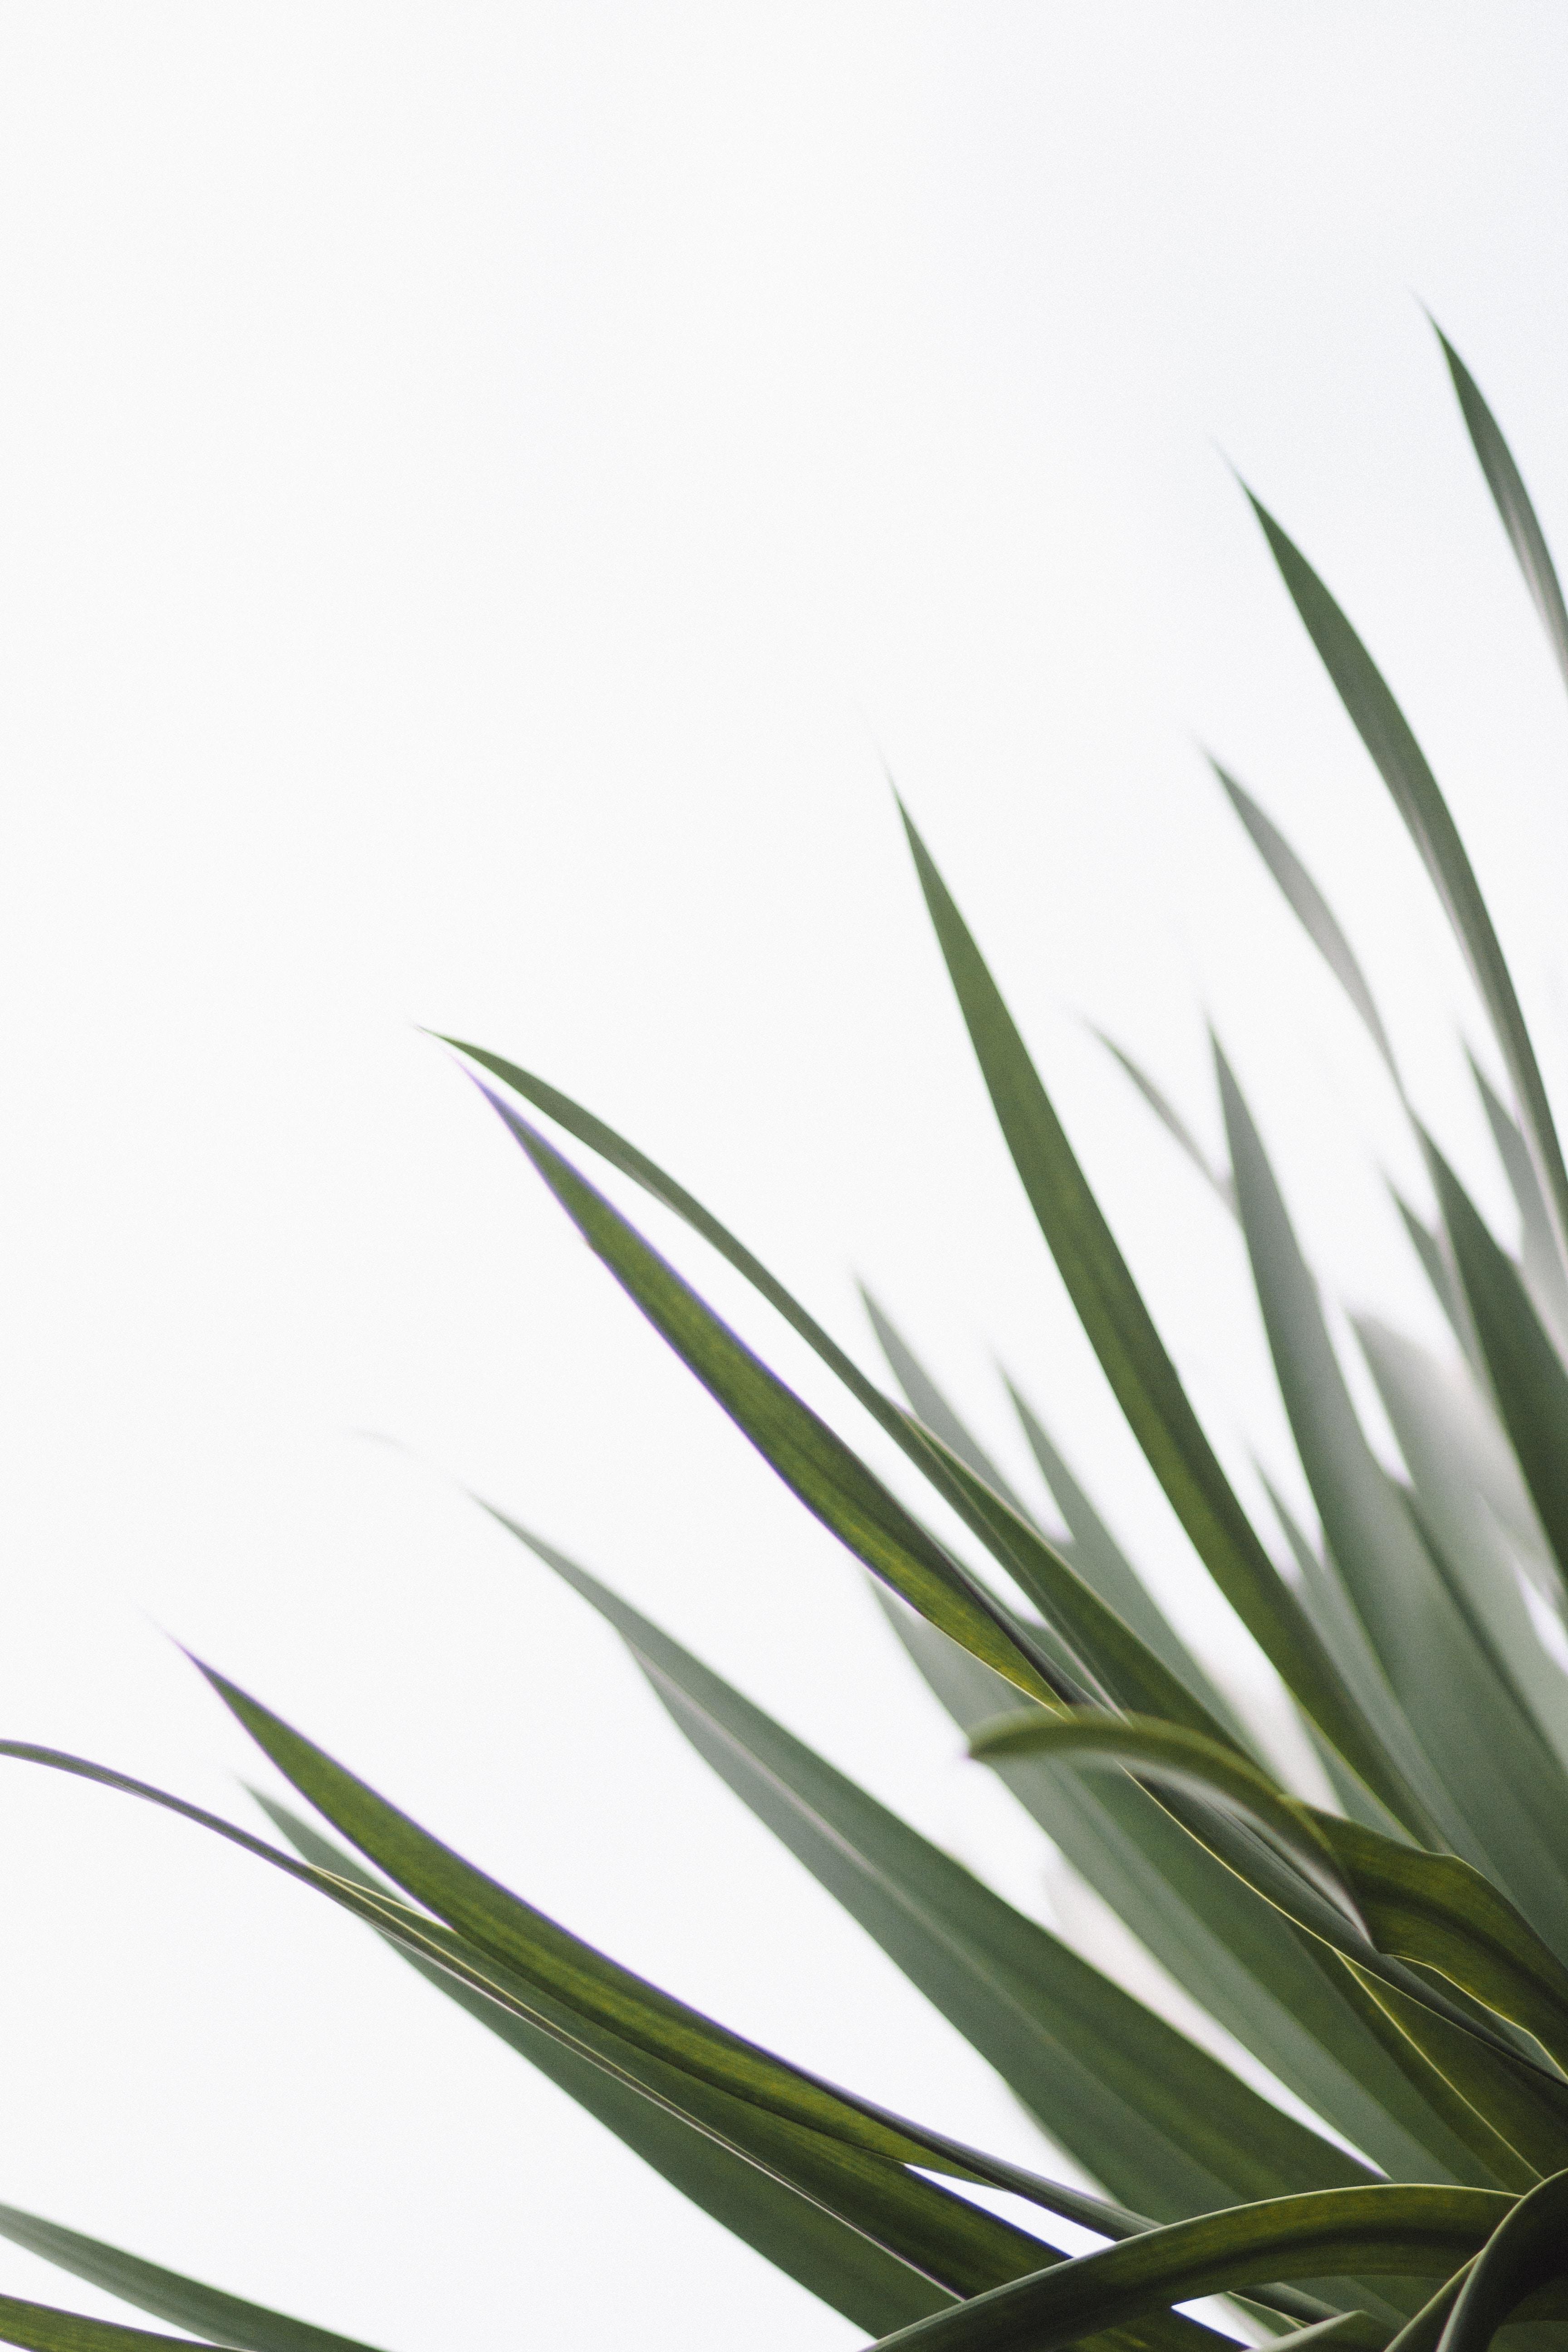 close-up photo of green leaf